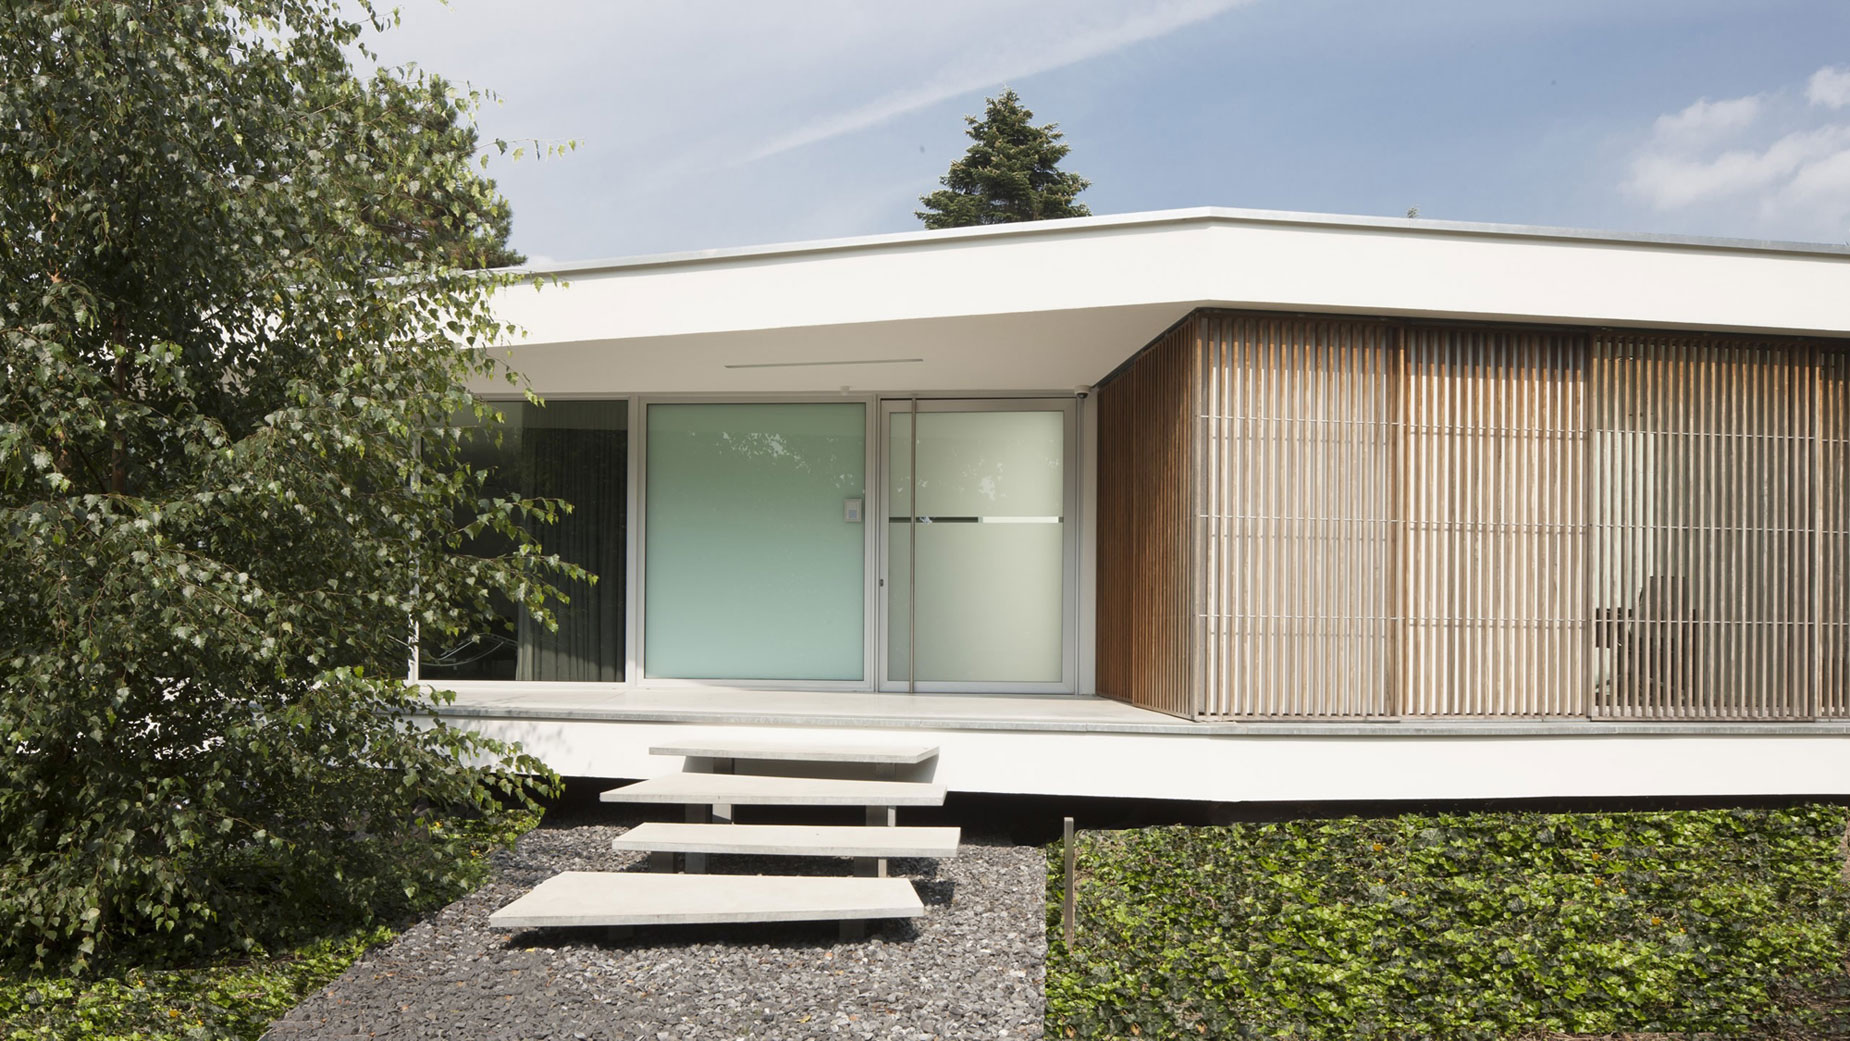 Boxed Villa Spee Haelen with Panoramic Windows by Lab32 architecten-09